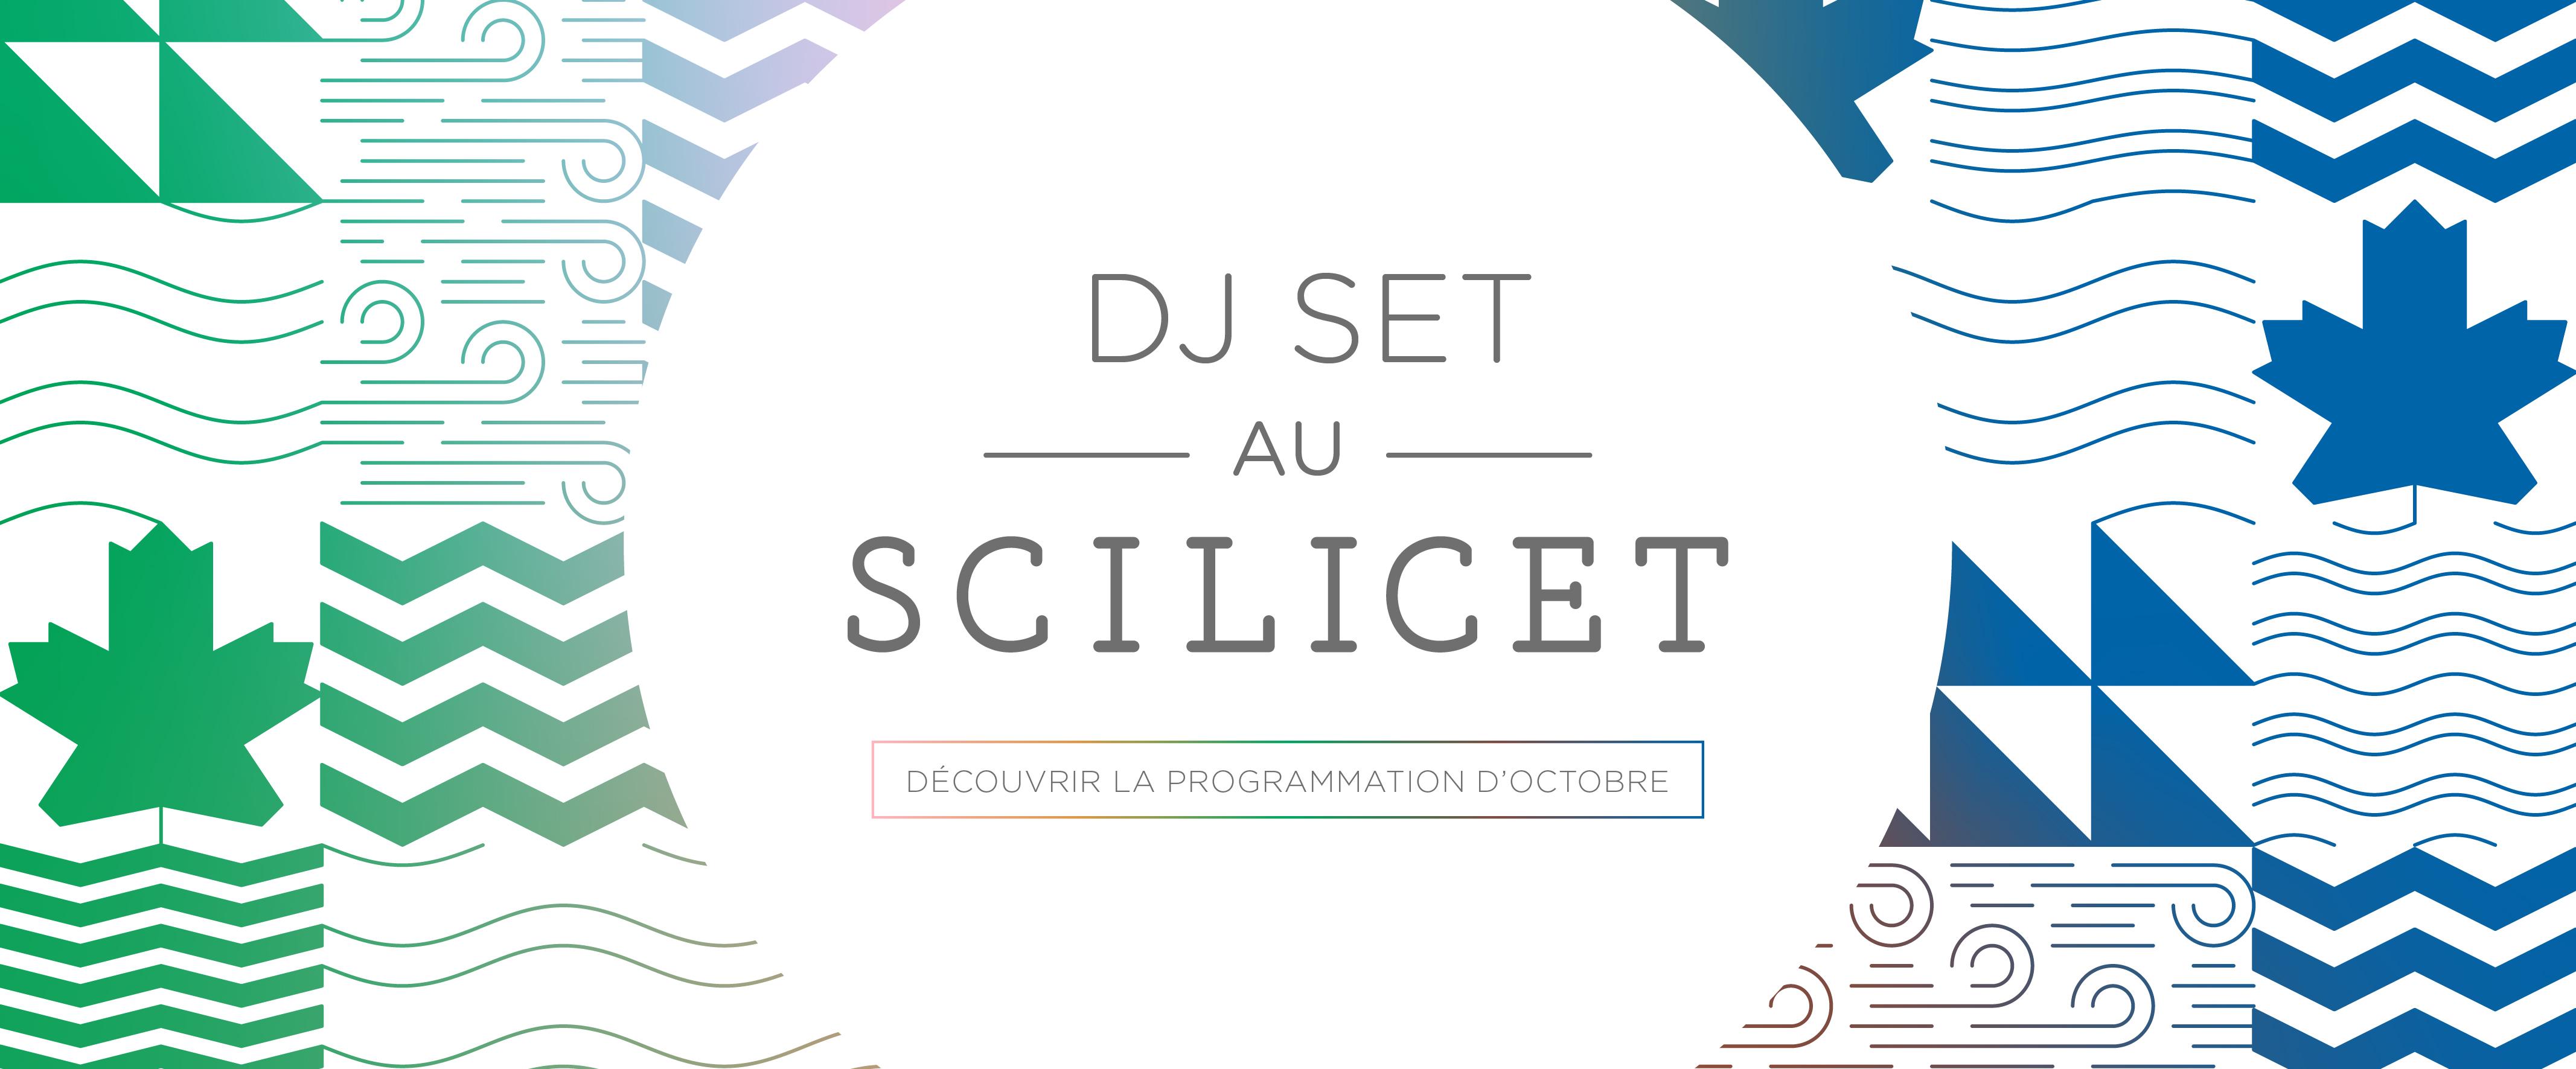 Agenda de la programmation du Scilicet – Octobre